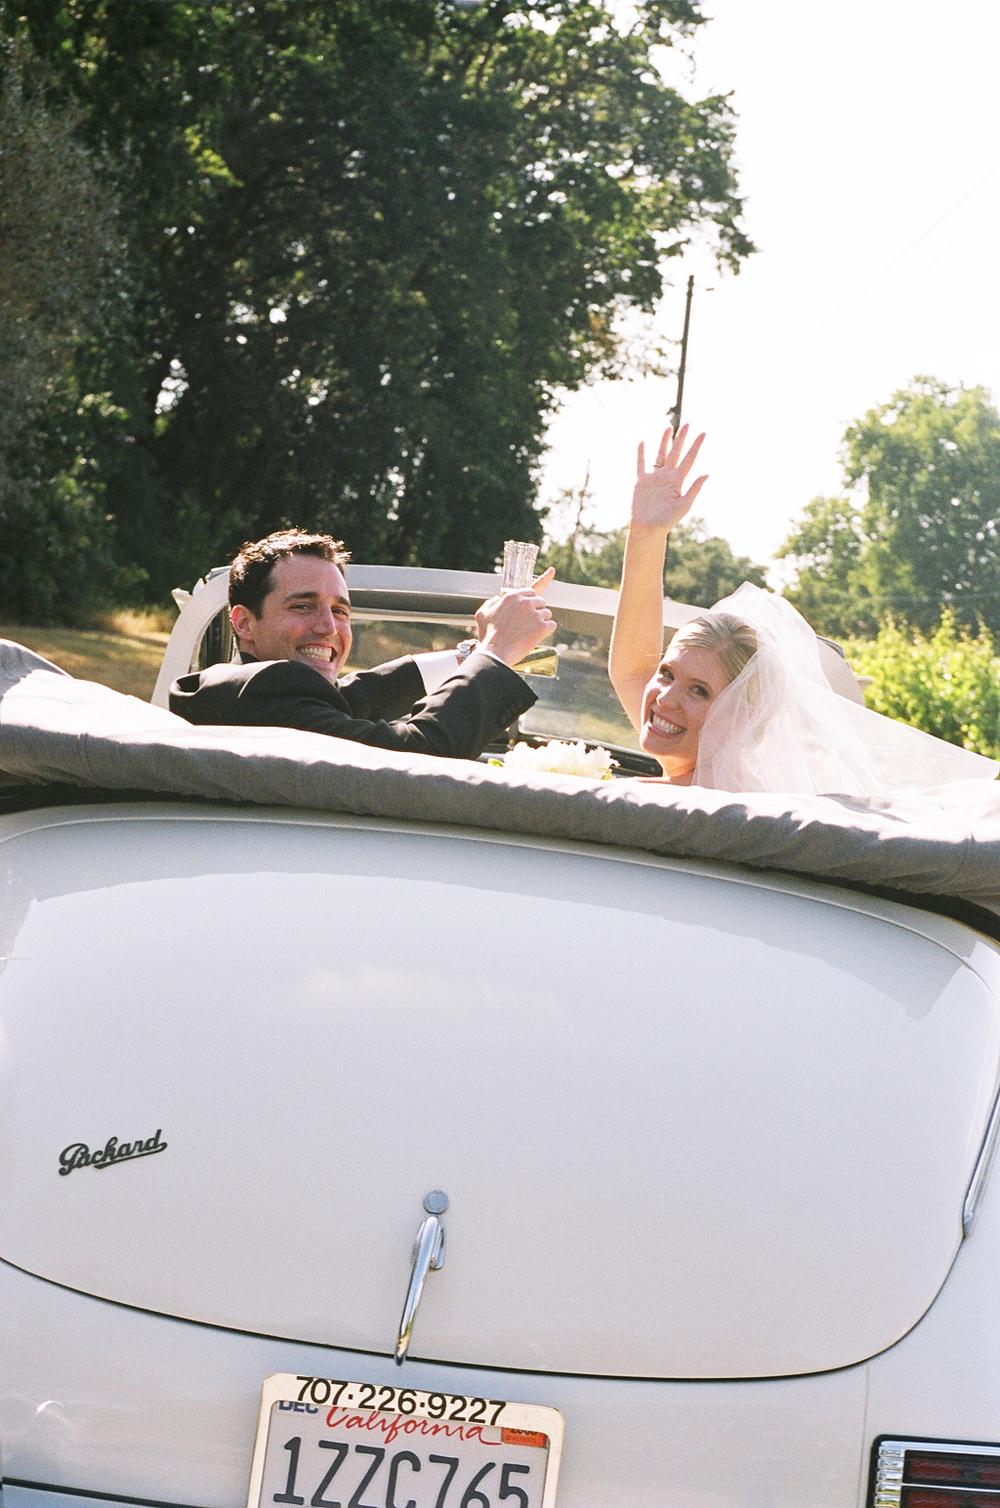 sylvie-gil-film-photography-wedding-car-flowers-bride-groom-details